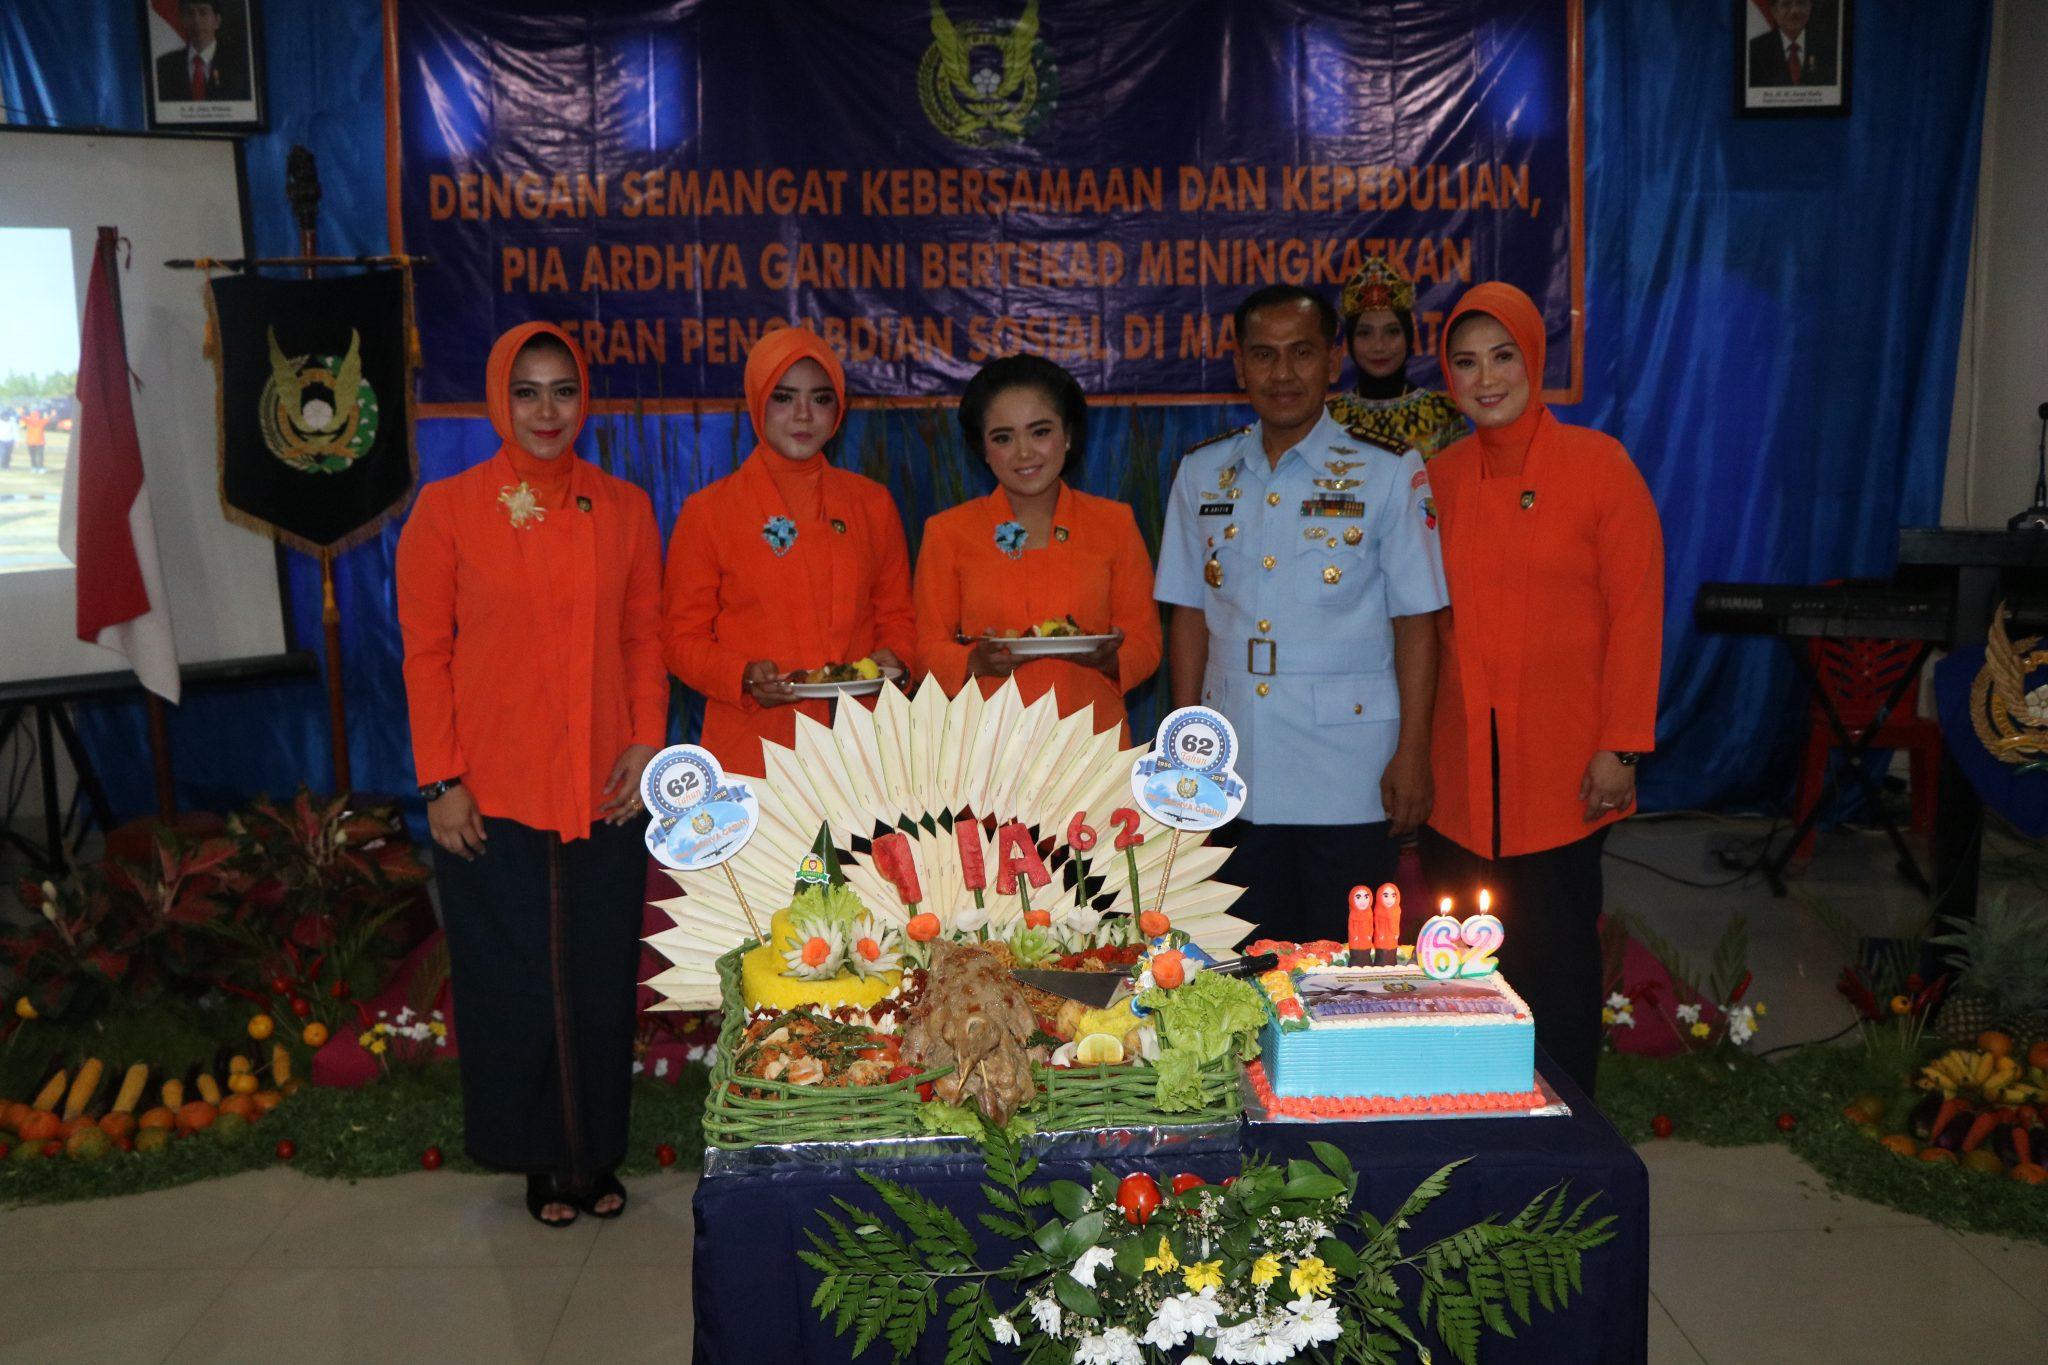 HUT ke-62 PIA Ardhya Garini di Lanud Anang Busra Tarakan